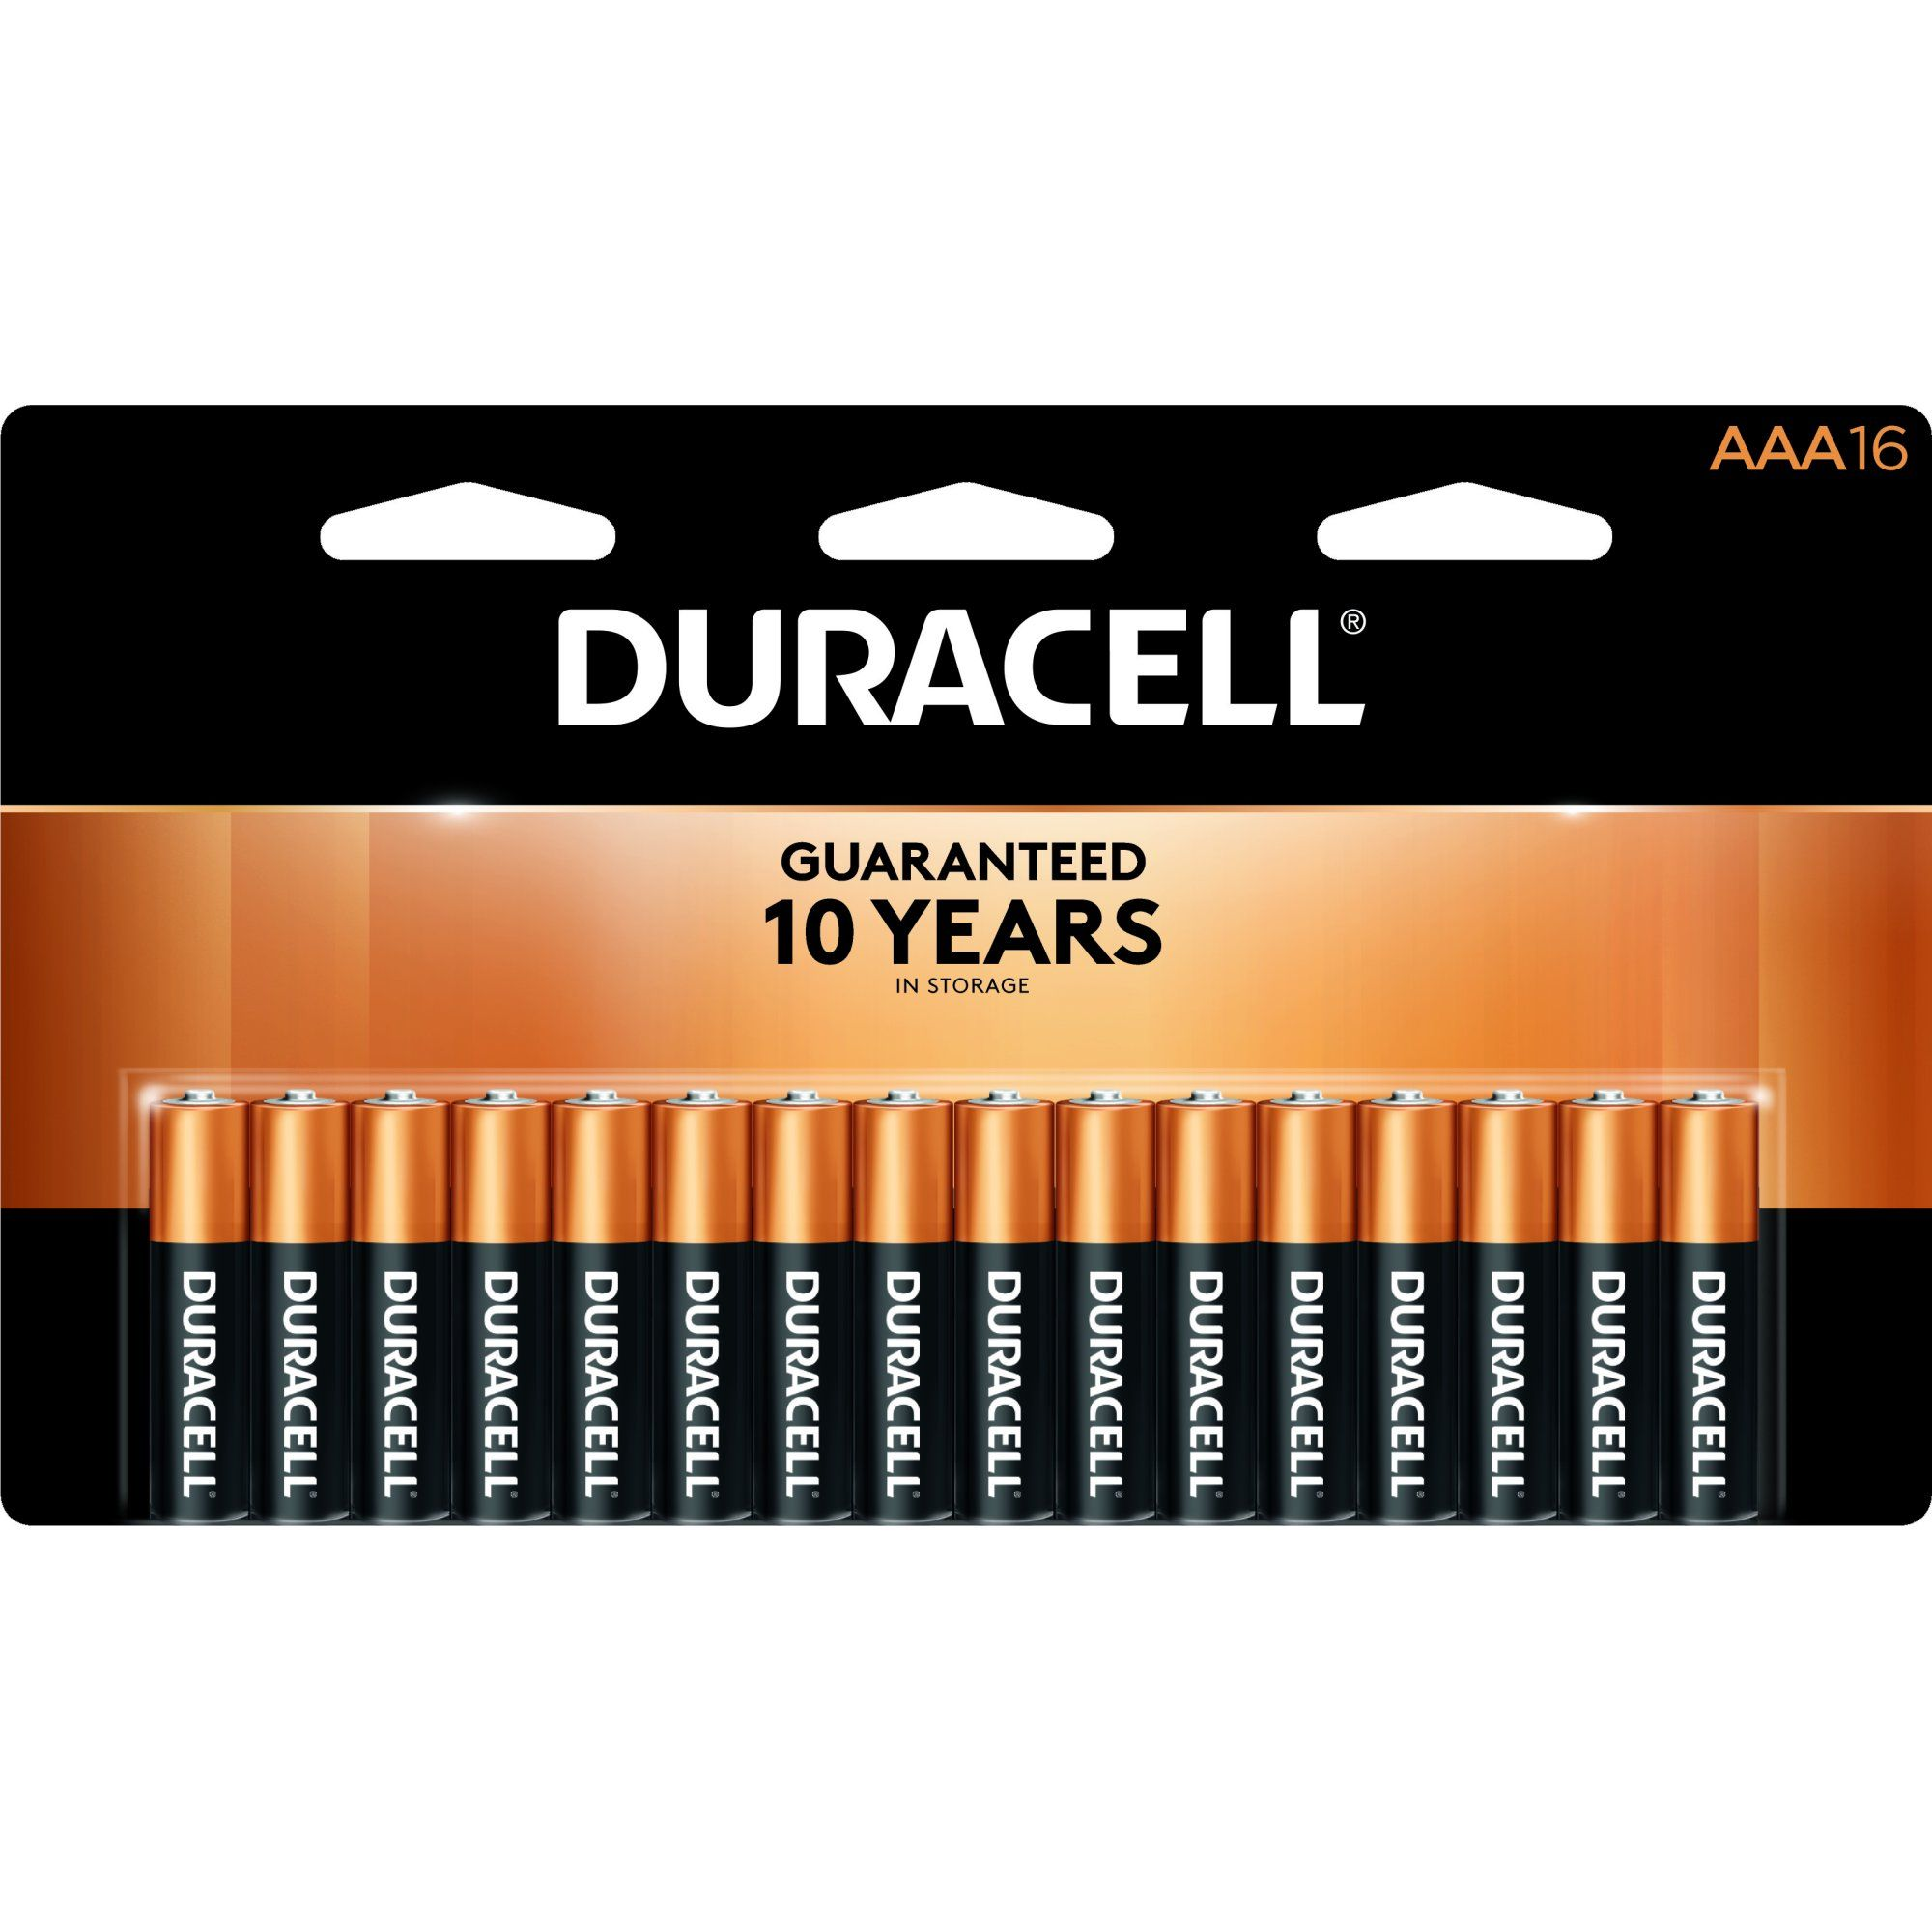 Duracell Coppertop Aaa Battery Long Lasting Triple A Batteries 16 Pack Walmart Com Duracell Alkaline Battery Basic Office Supplies